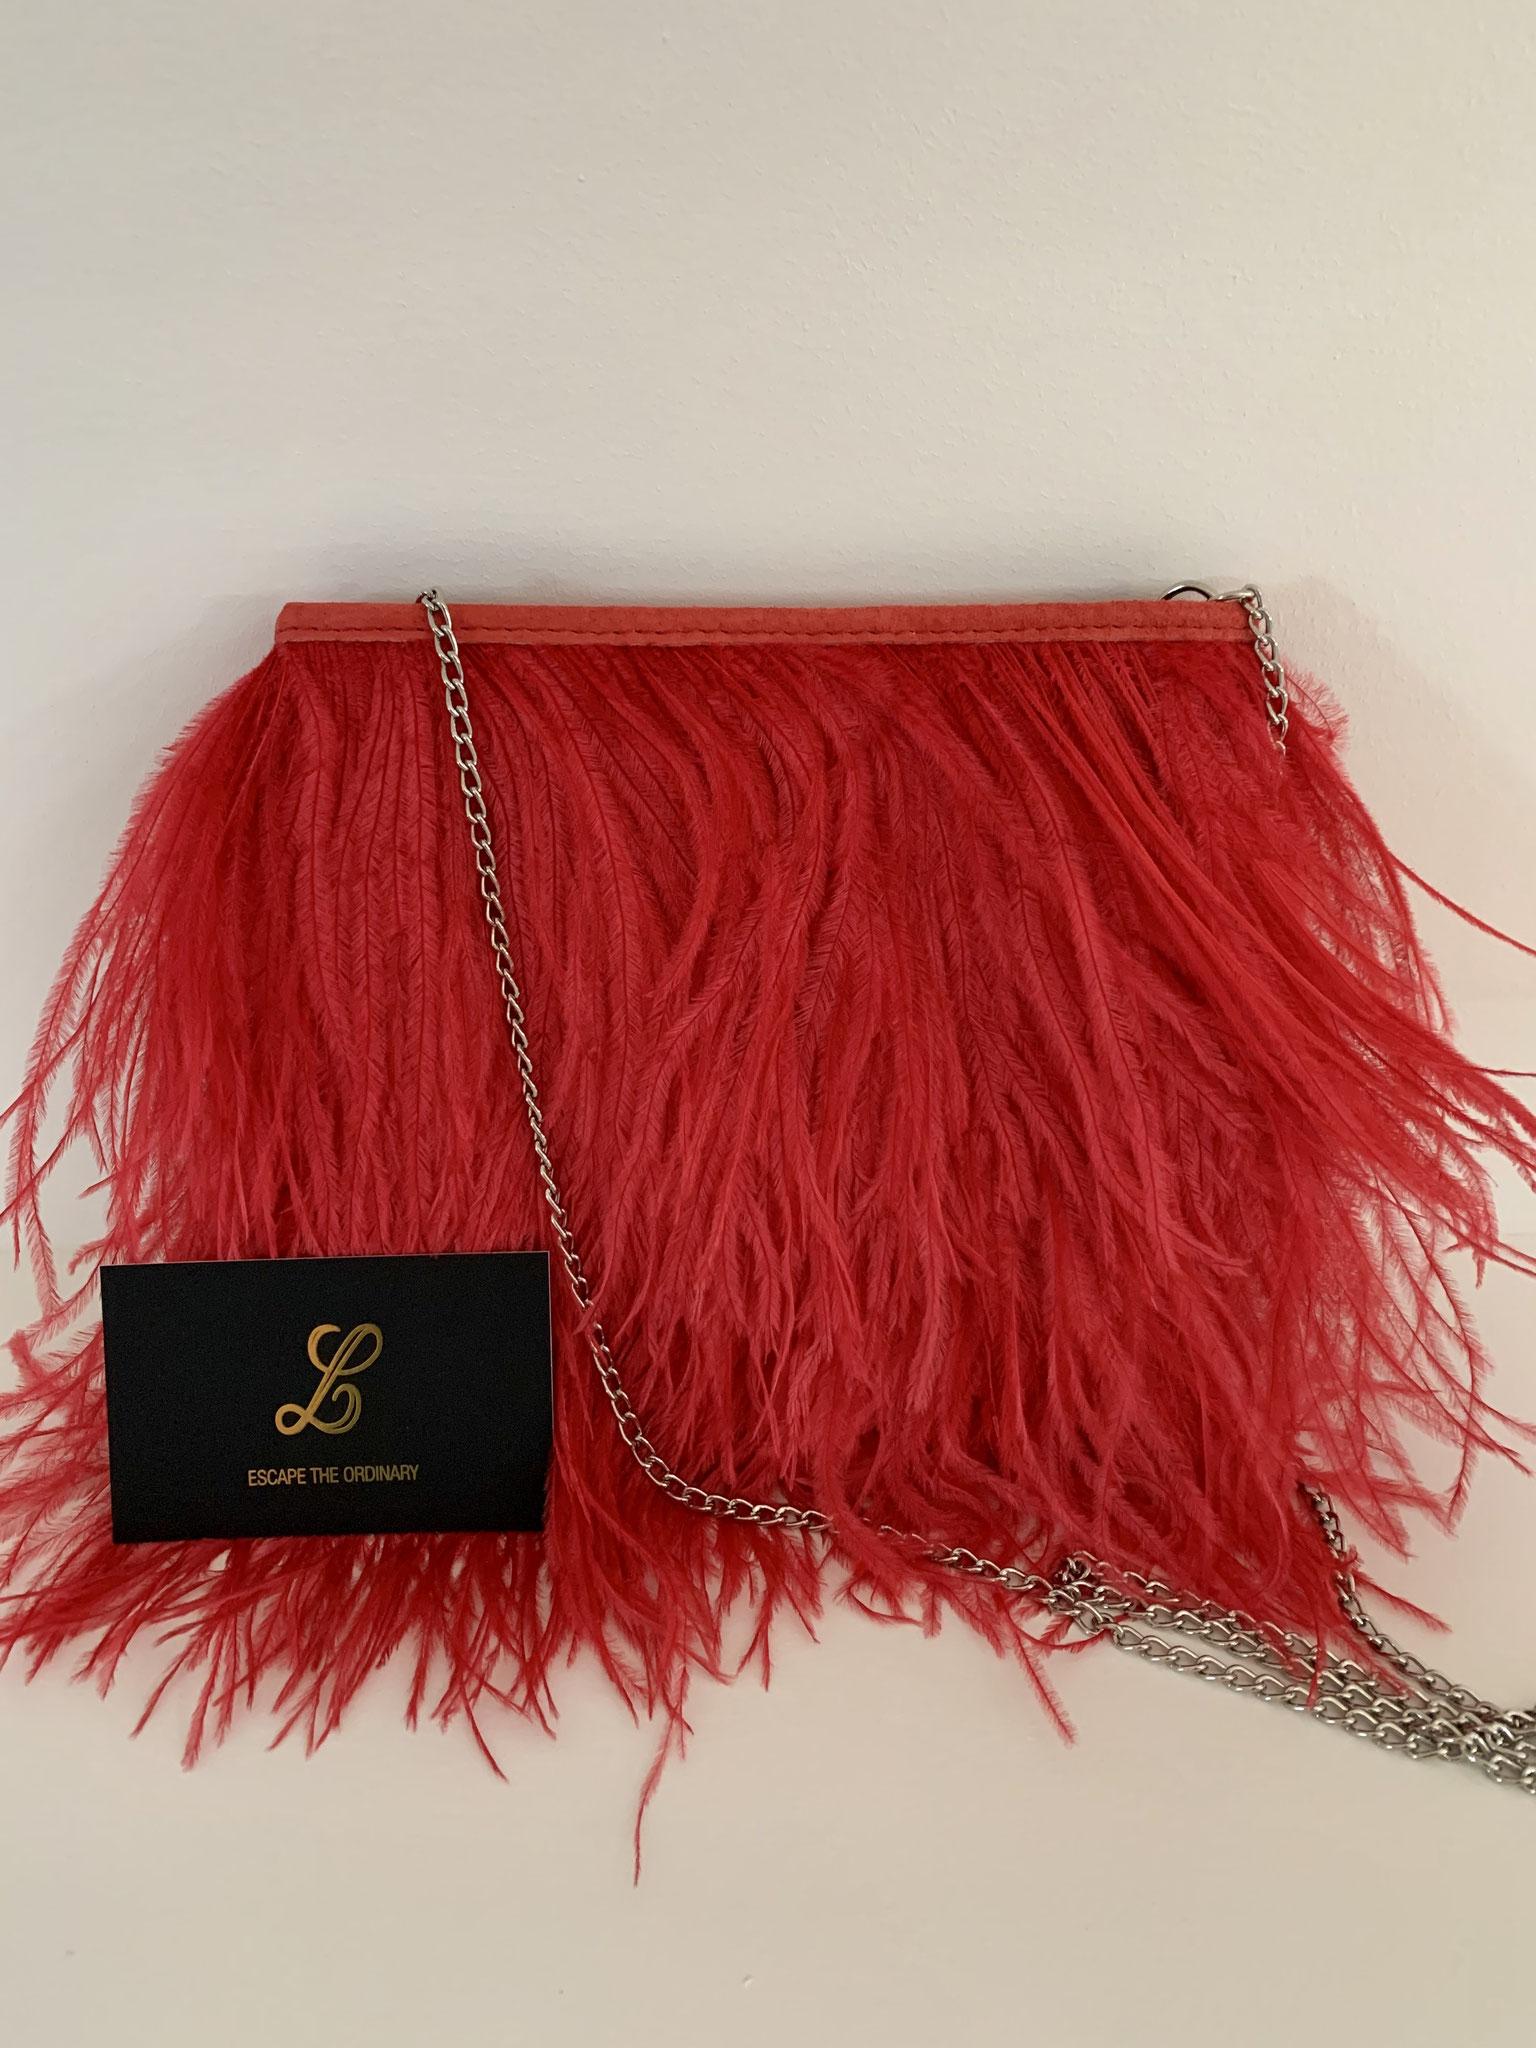 Ostrich feather bag met daim - 125€